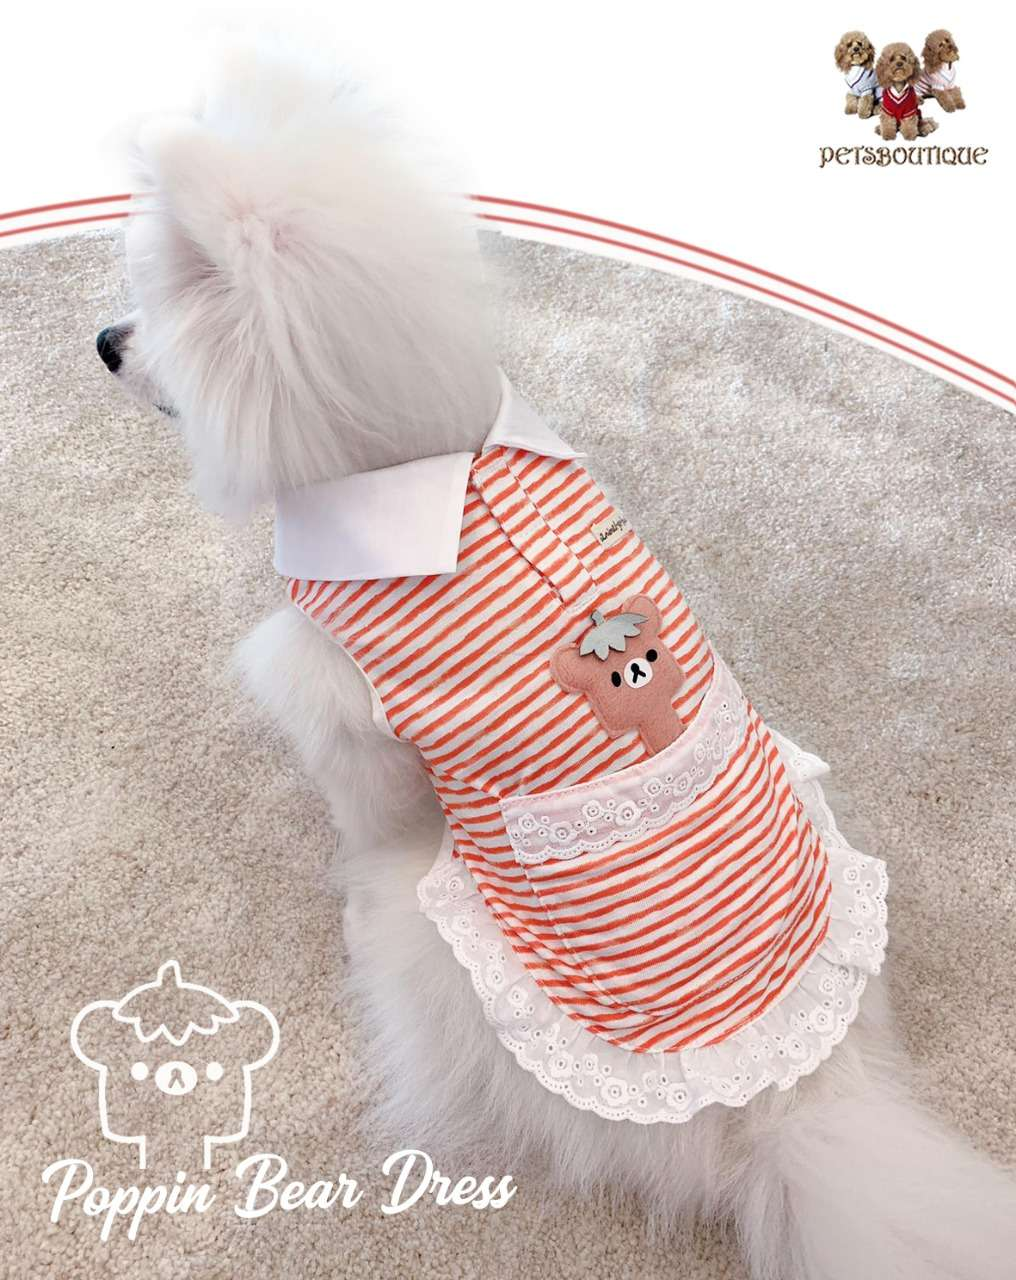 Animal Go Round - Poppin Bear Dress Photo